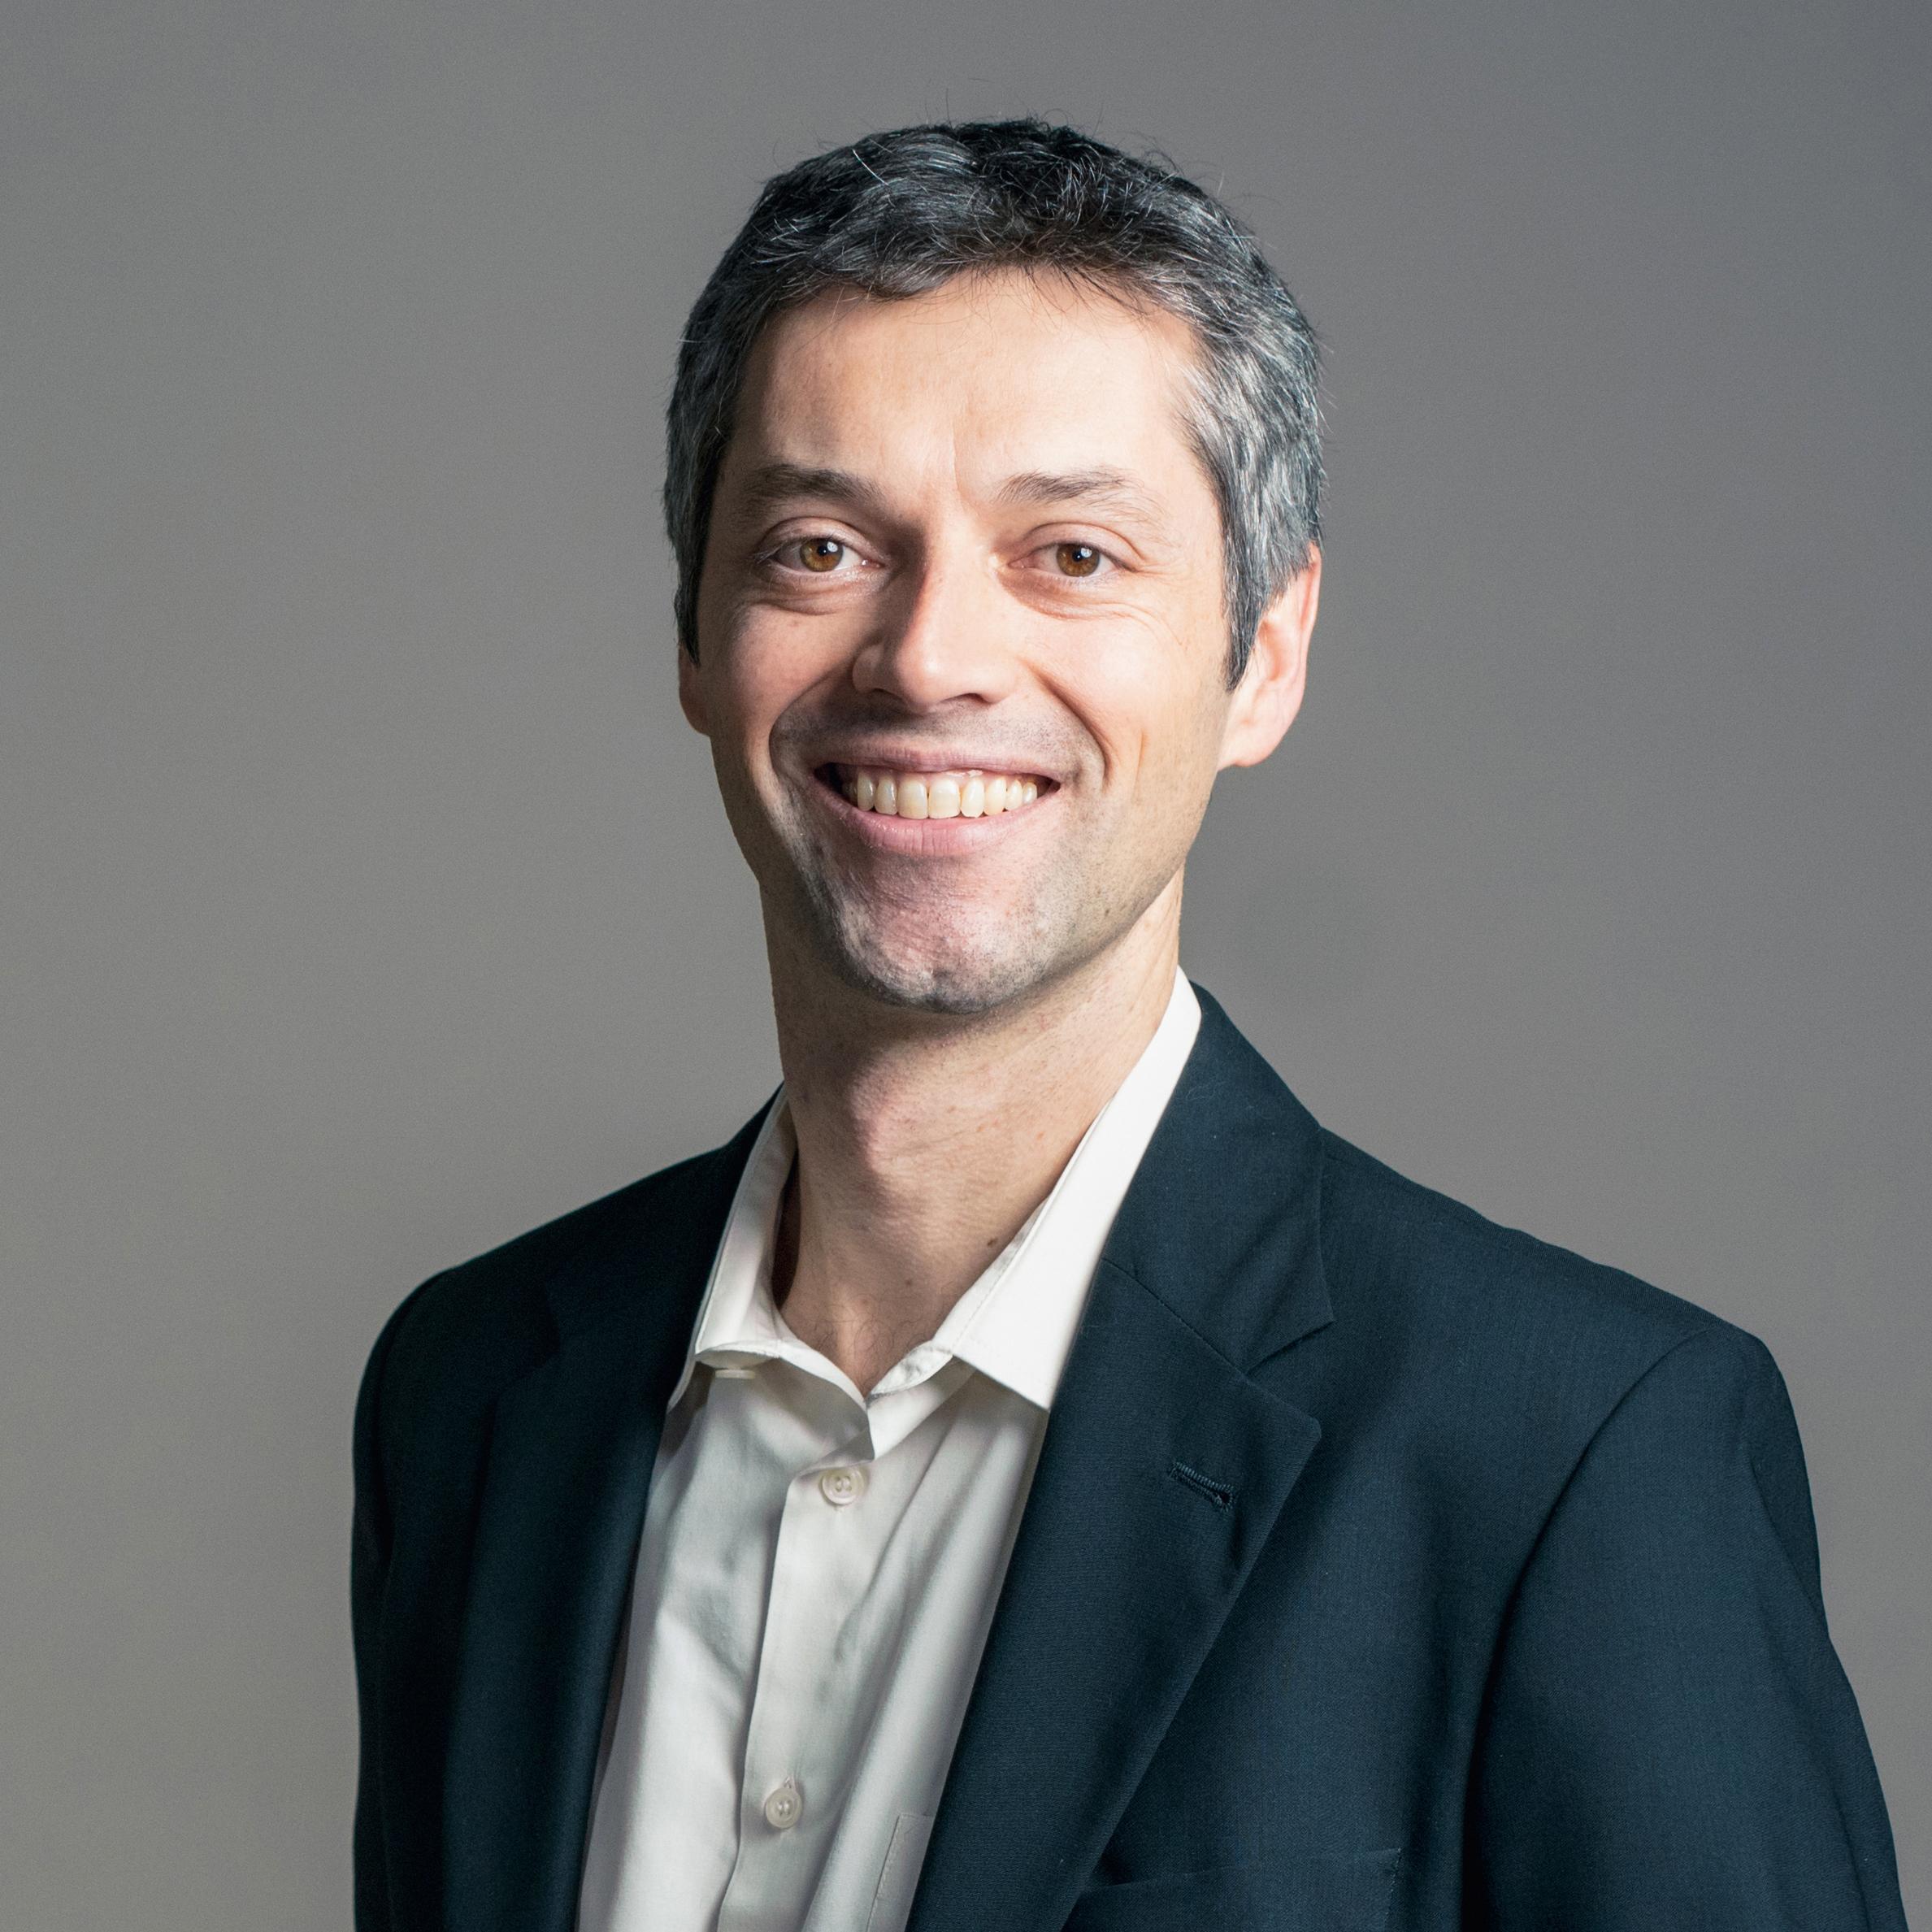 Olivier Joss